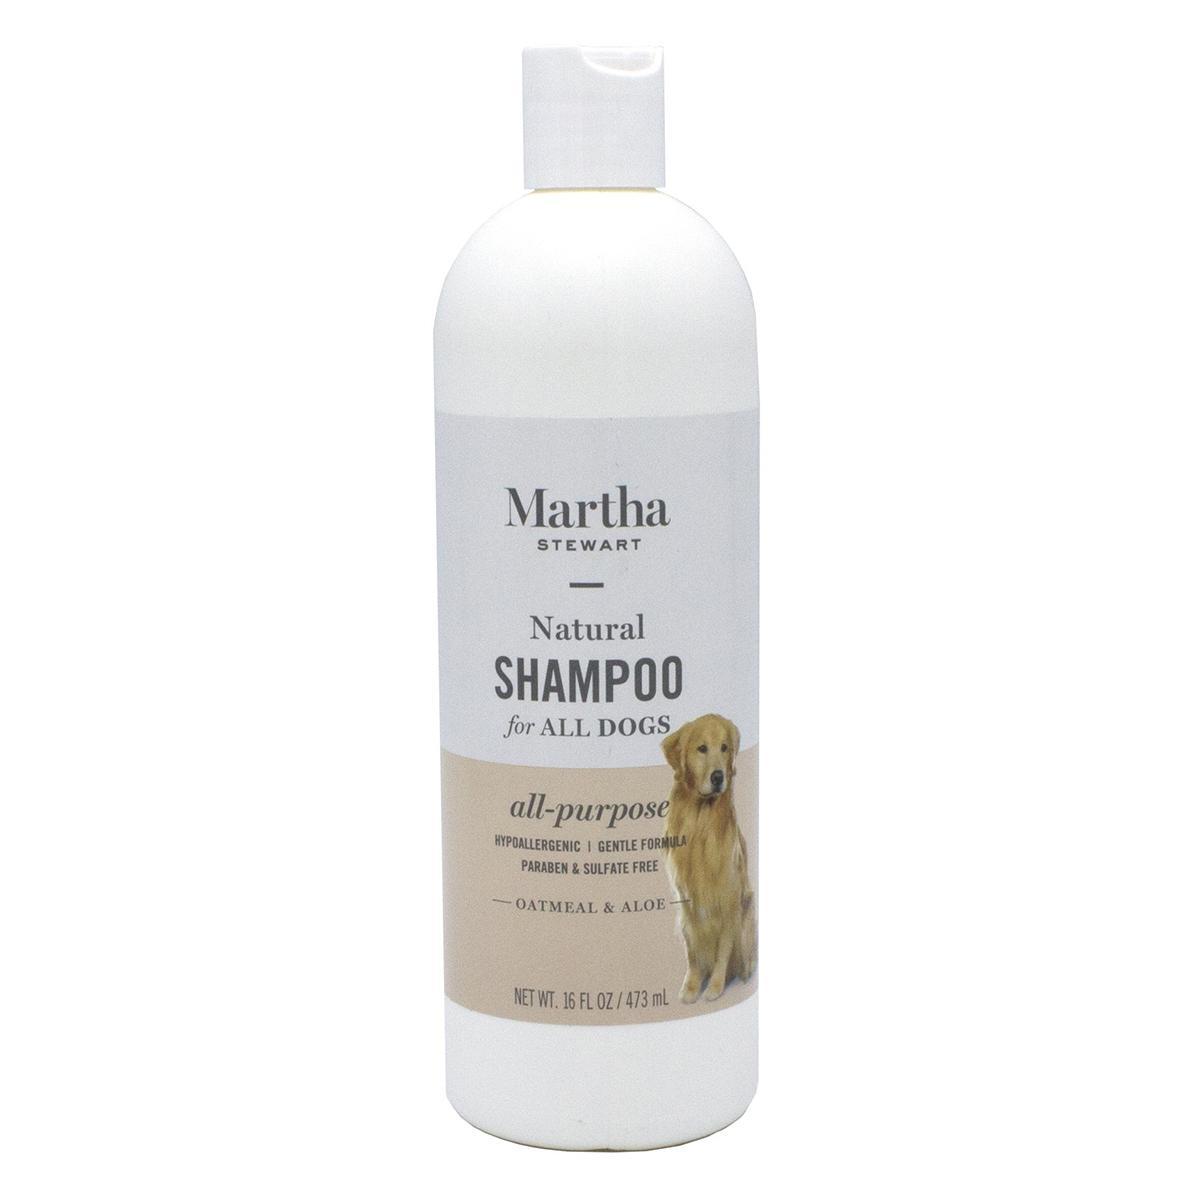 Martha Stewart All-Purpose Shampoo for Dogs with Oatmeal and Aloe